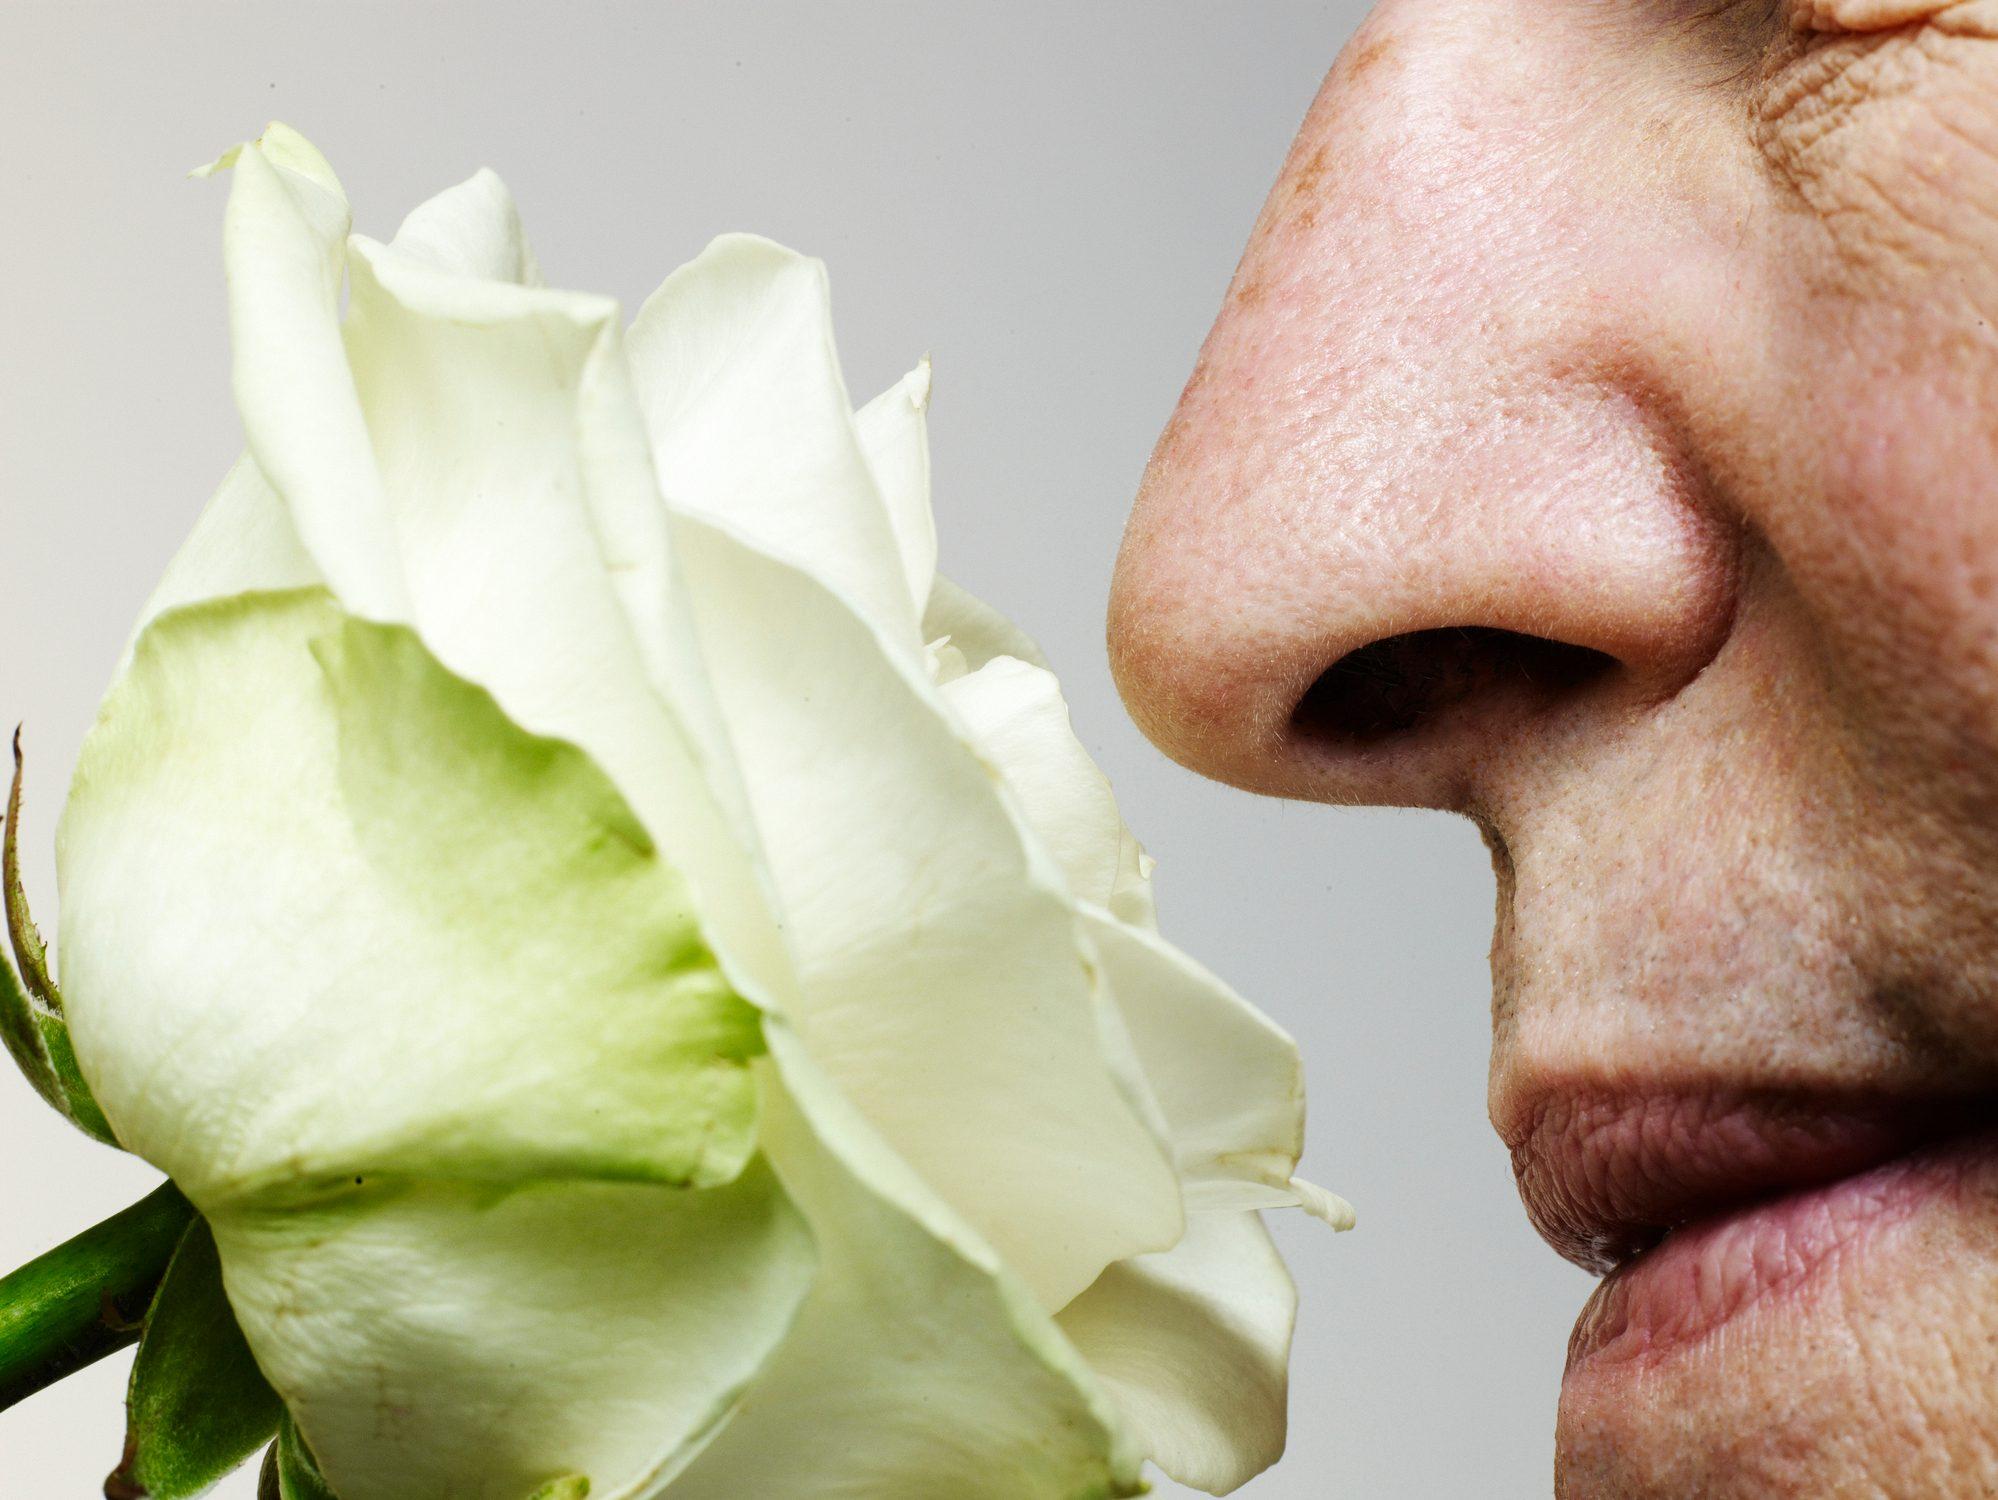 man smelling rose, close-up